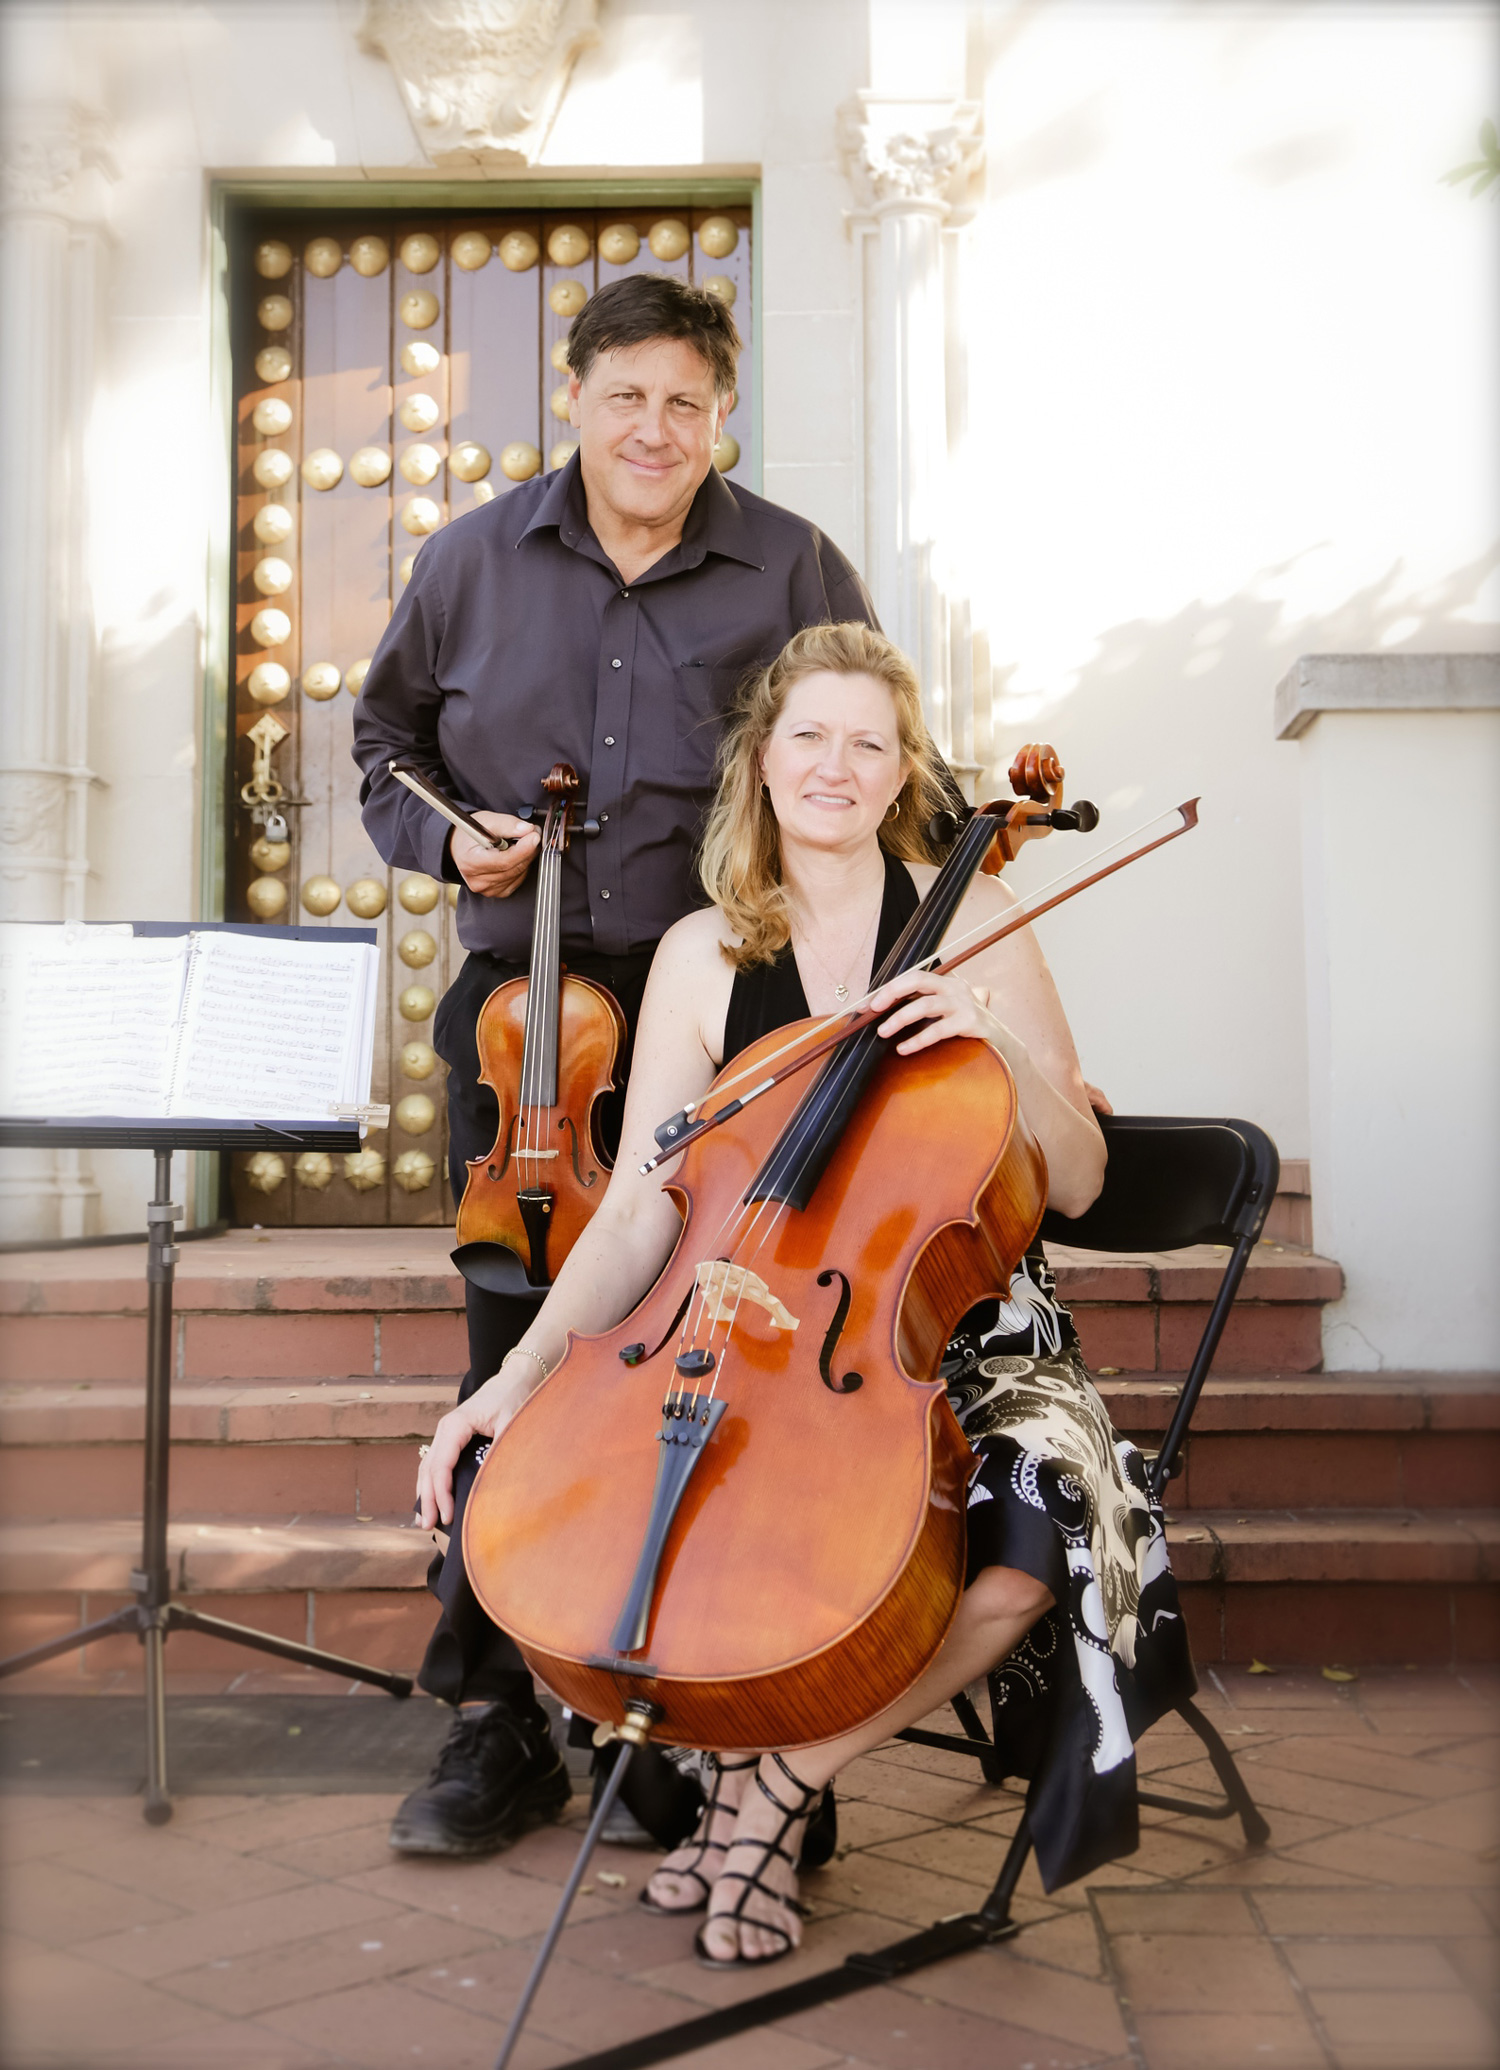 Robert-Lynne-Hearst-Castle-event-music-violin-cello.jpg